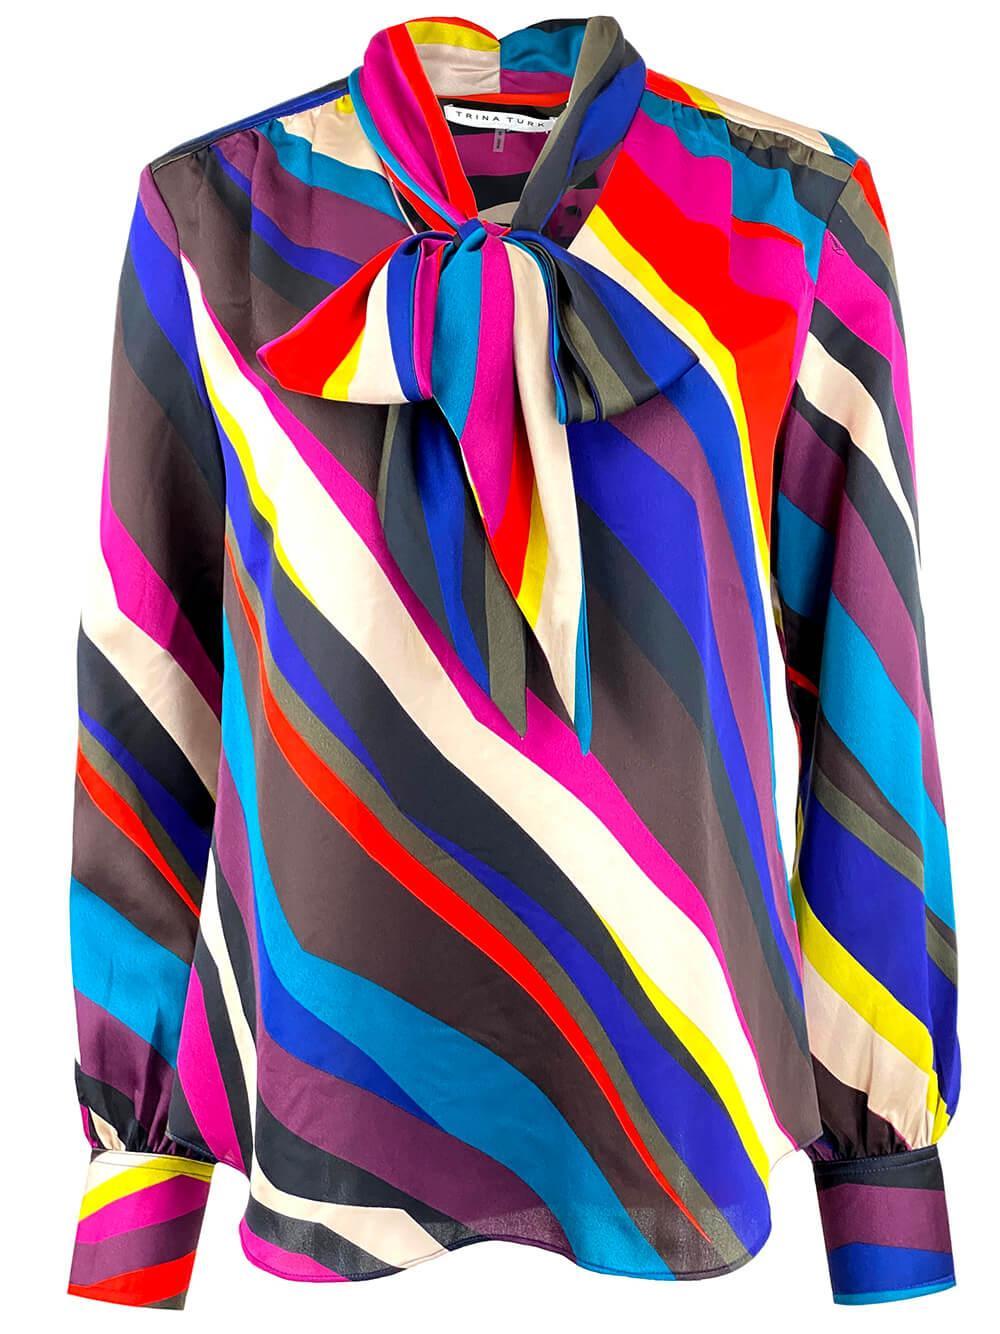 Demming Striped Blouse Item # 2108130PG1